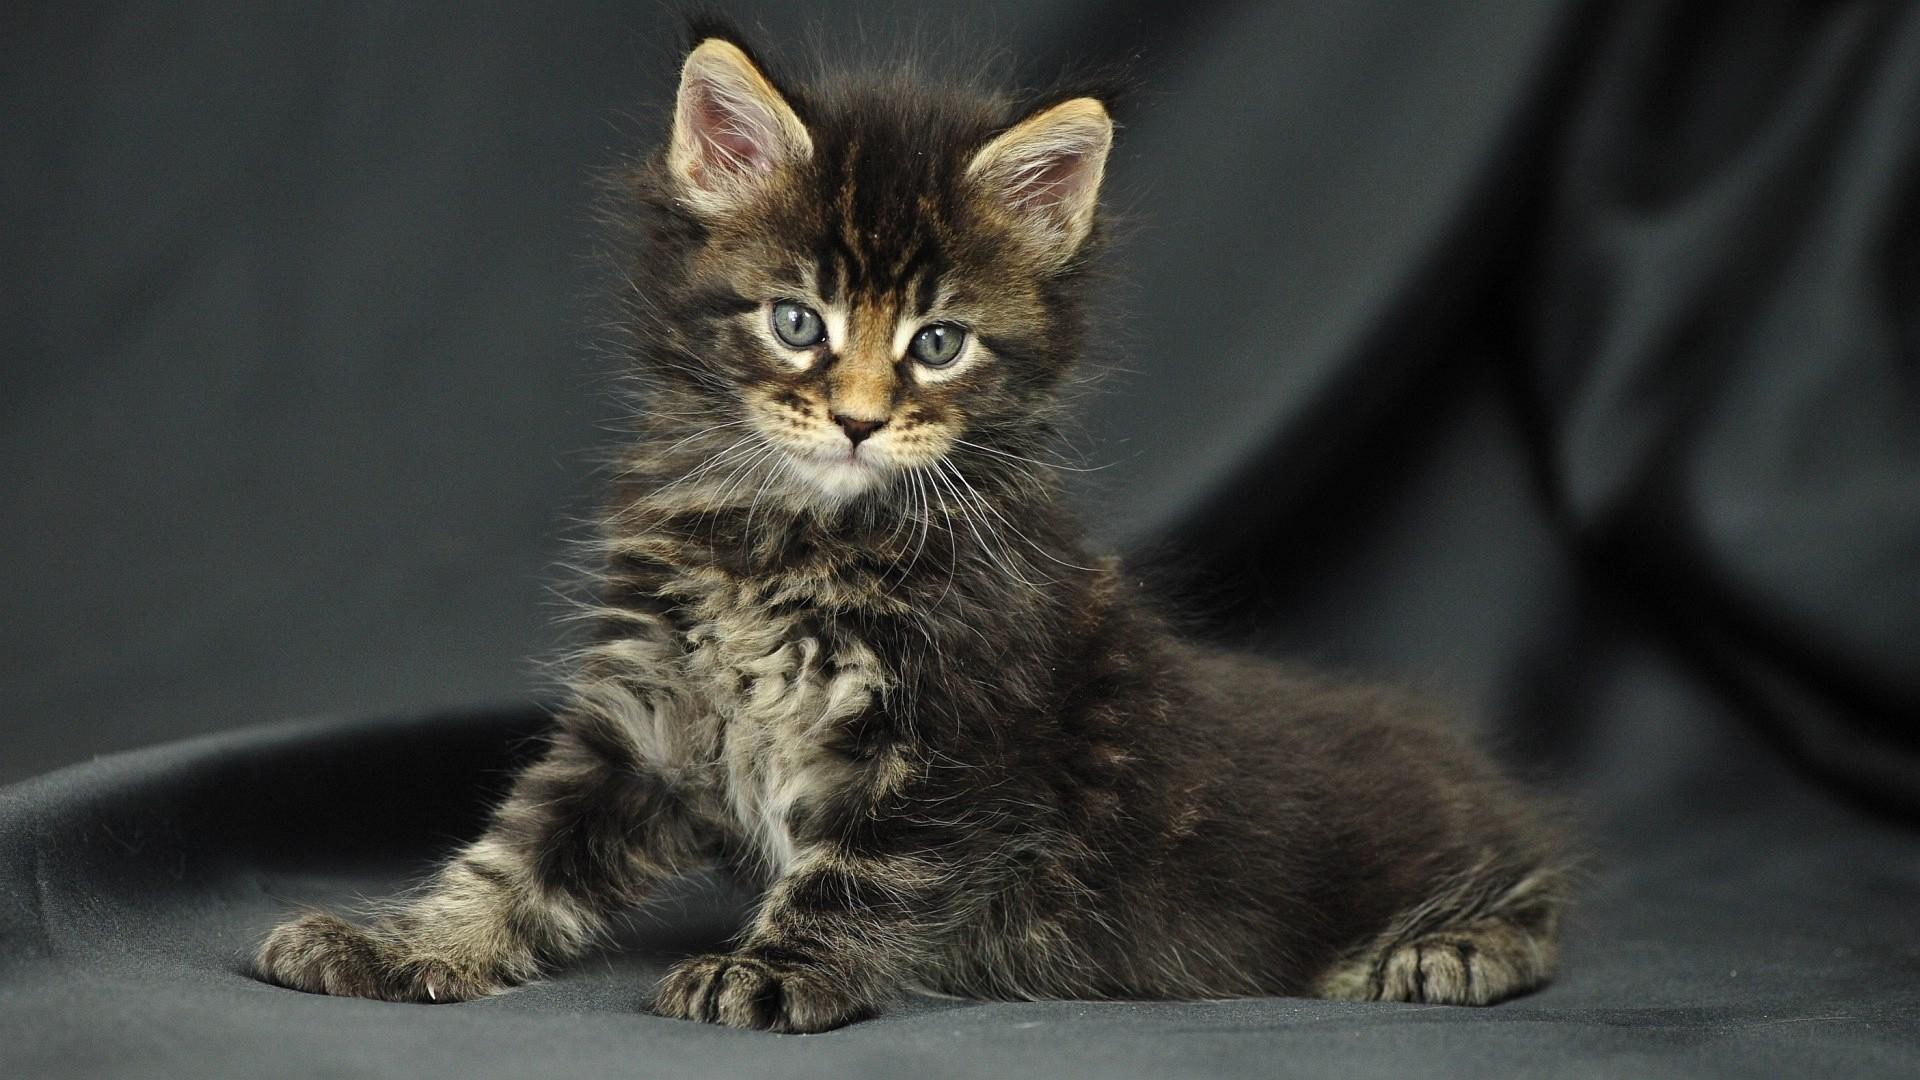 Sfondi gatti 61 immagini for Sfondi desktop animali